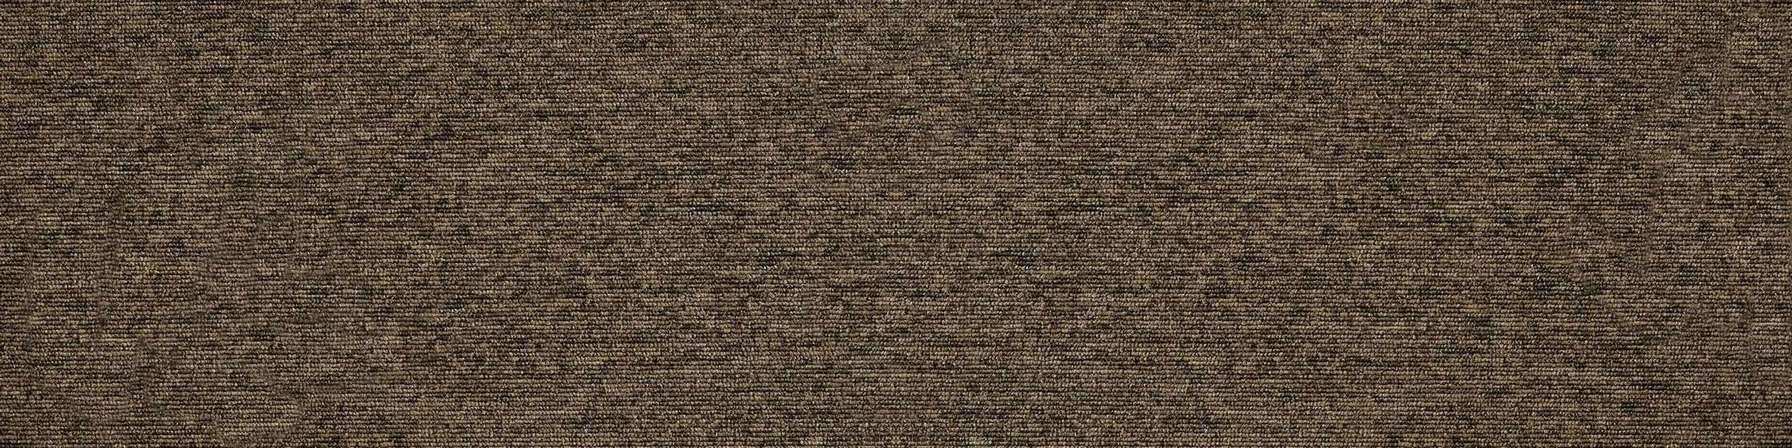 tivoli 21108 belize greige carpet plank